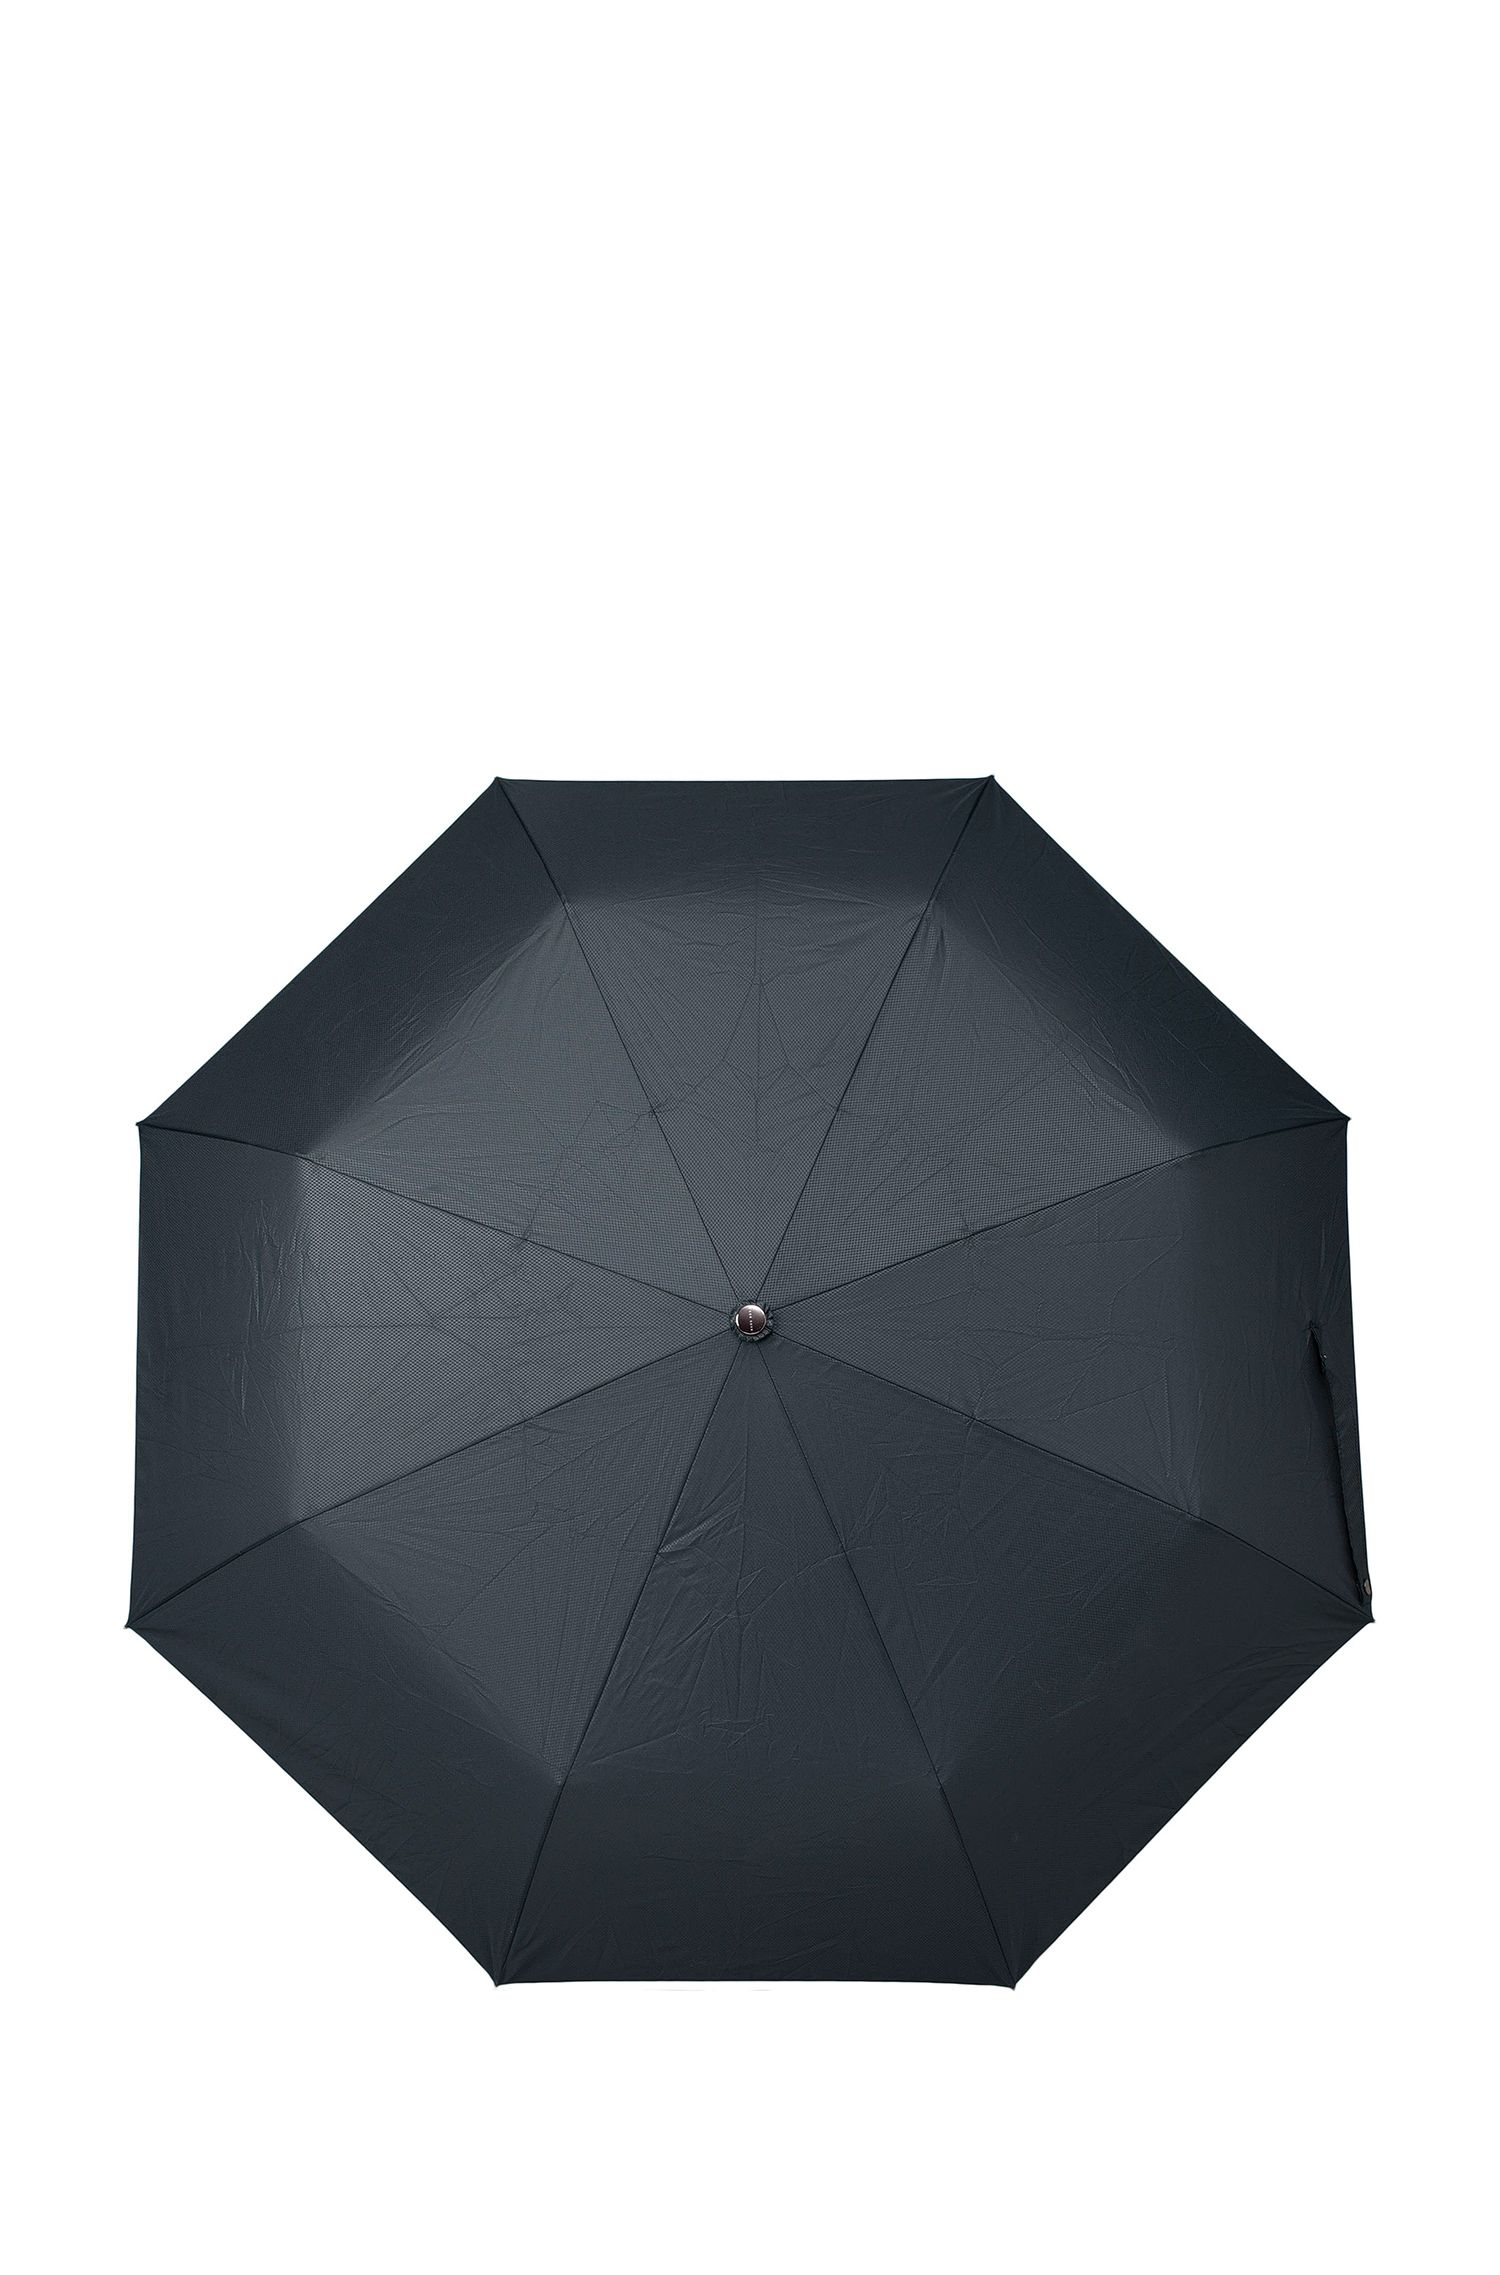 Aluminum Frame Patterned Pocket Umbrella | Umbrella New Loop Dark, Blue